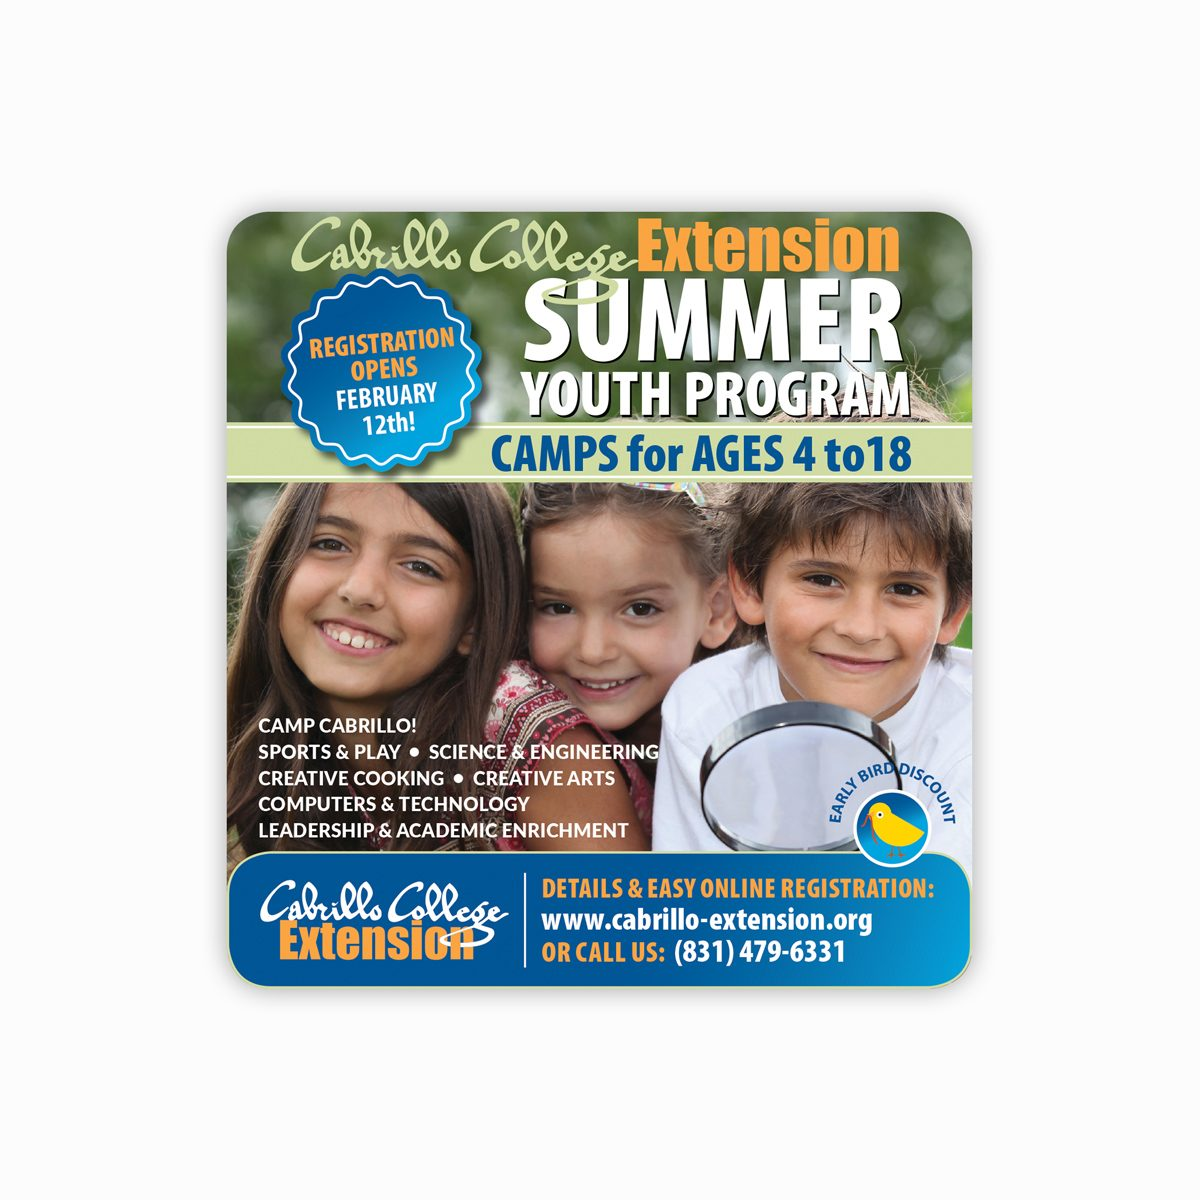 Cabrillo Youth Summer program for Good Times Santa Cruz publication